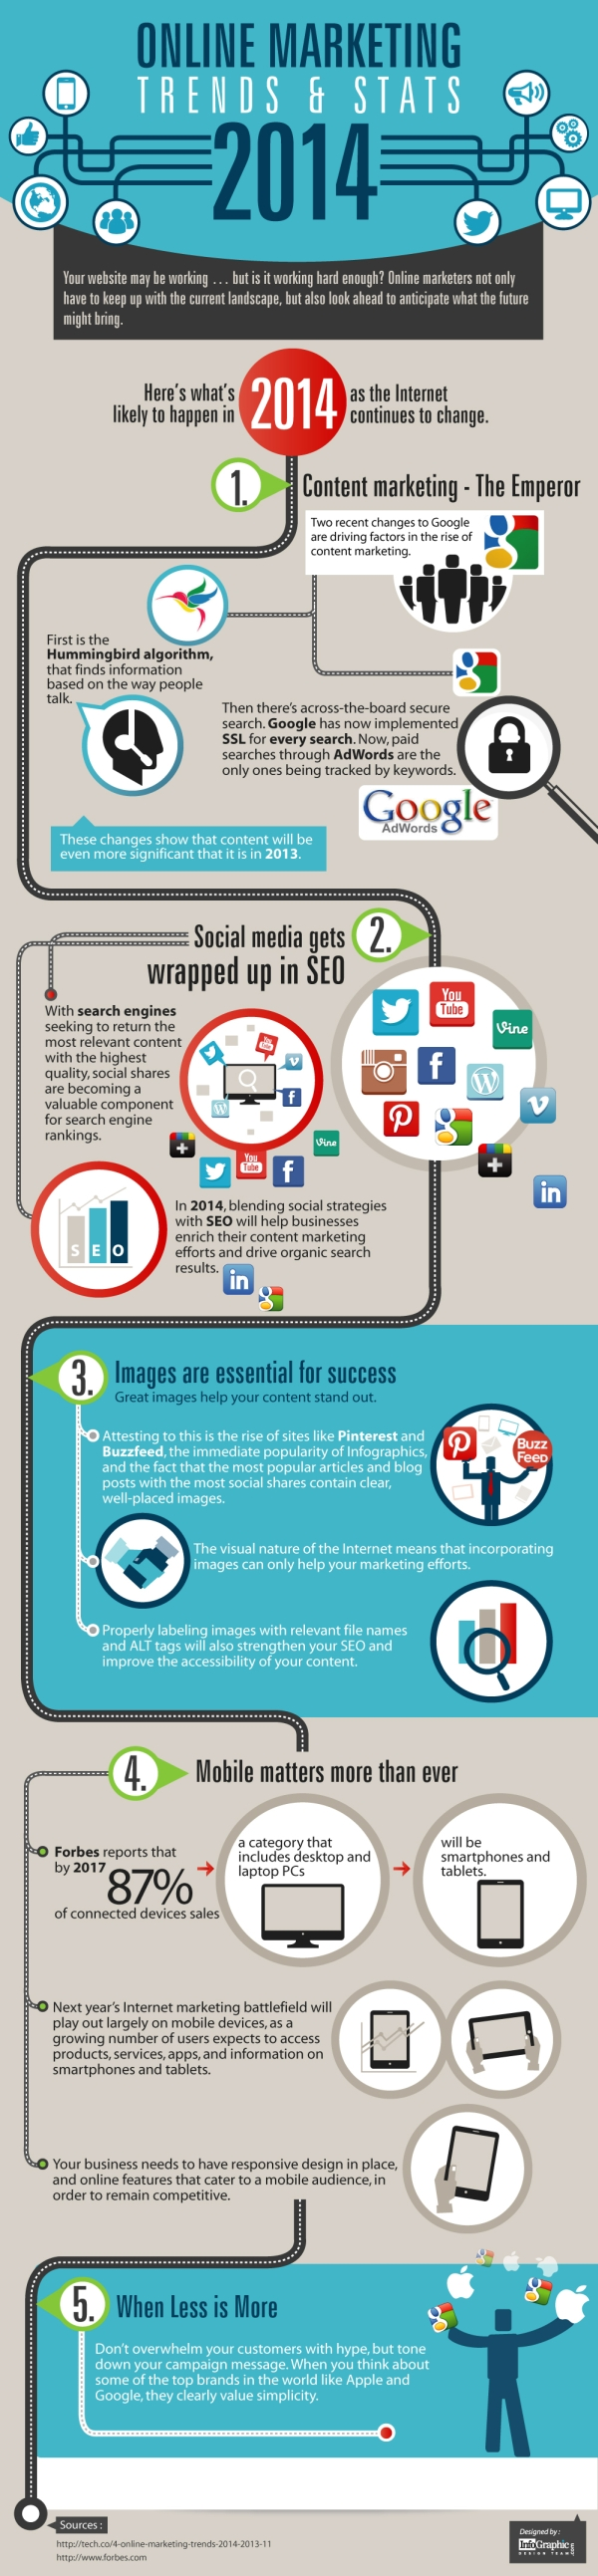 online marketing trends 2014 resized 600